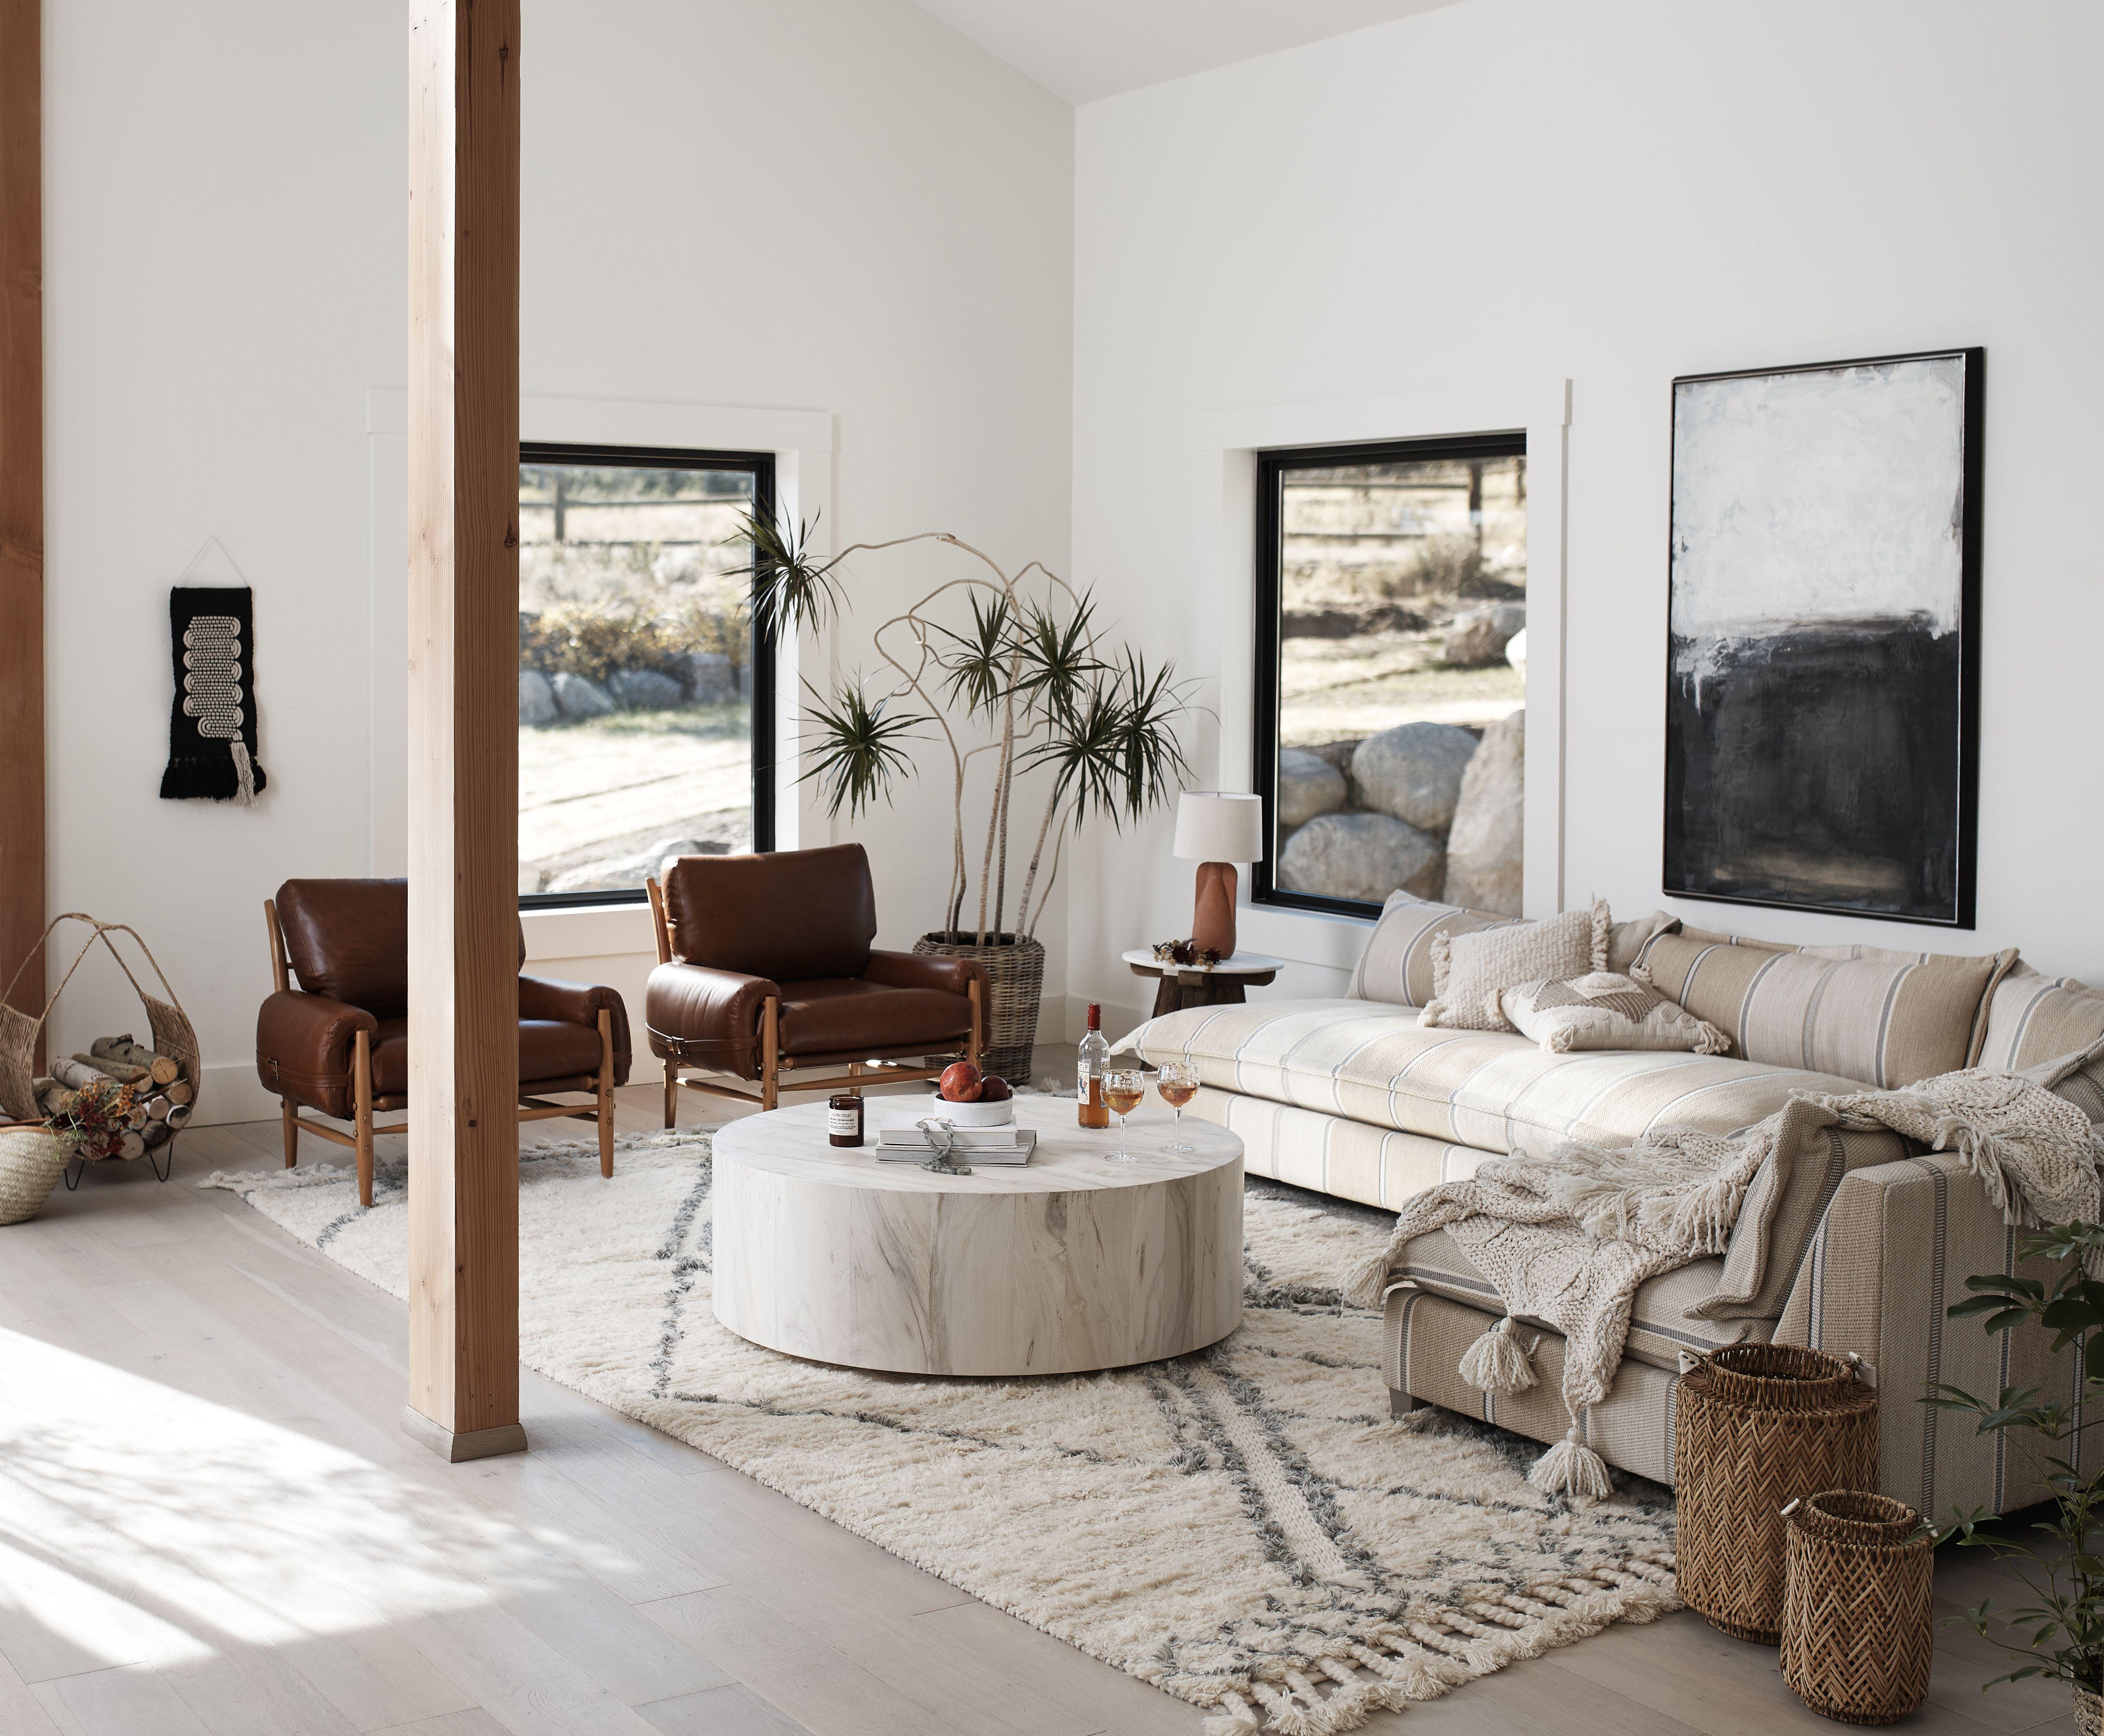 Swirled Drum Coffee Table Decor Home Decor Living Room